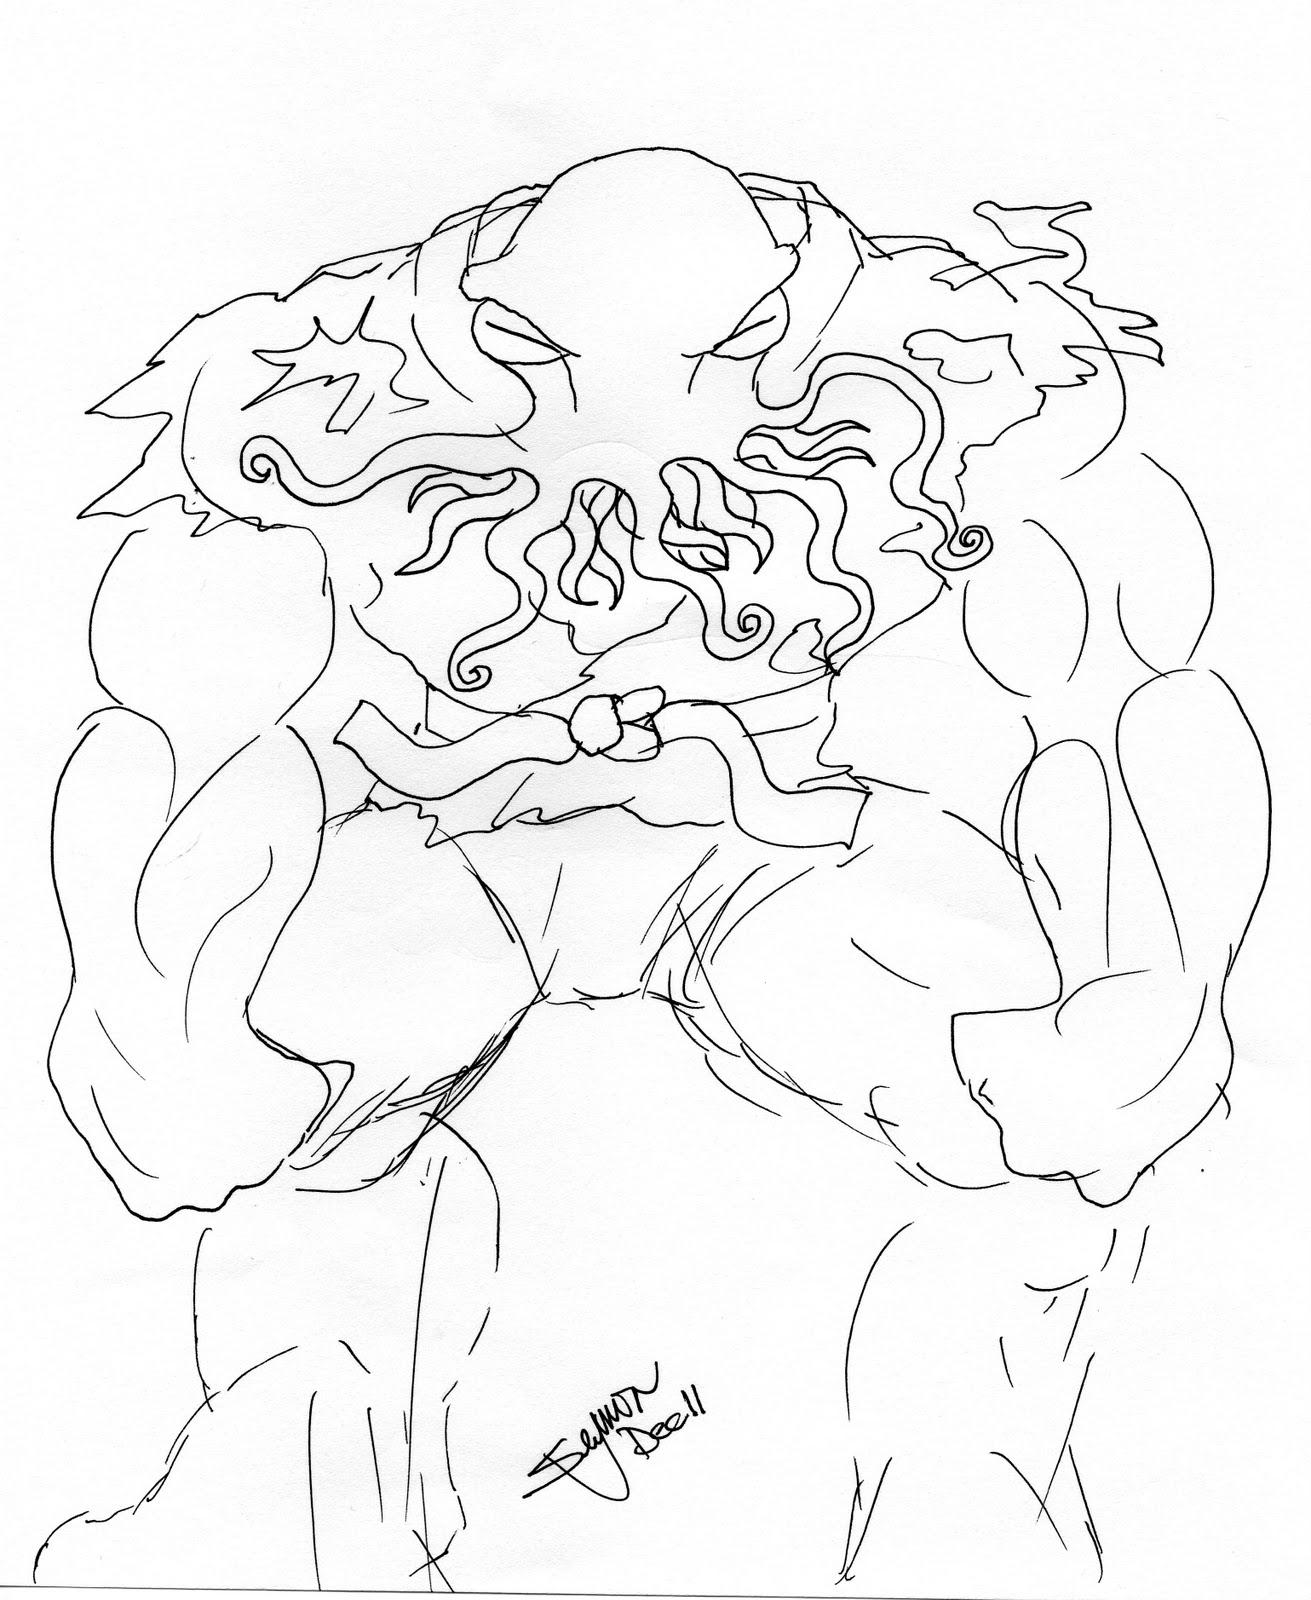 meerkatsu art octjitsu man and octodragon